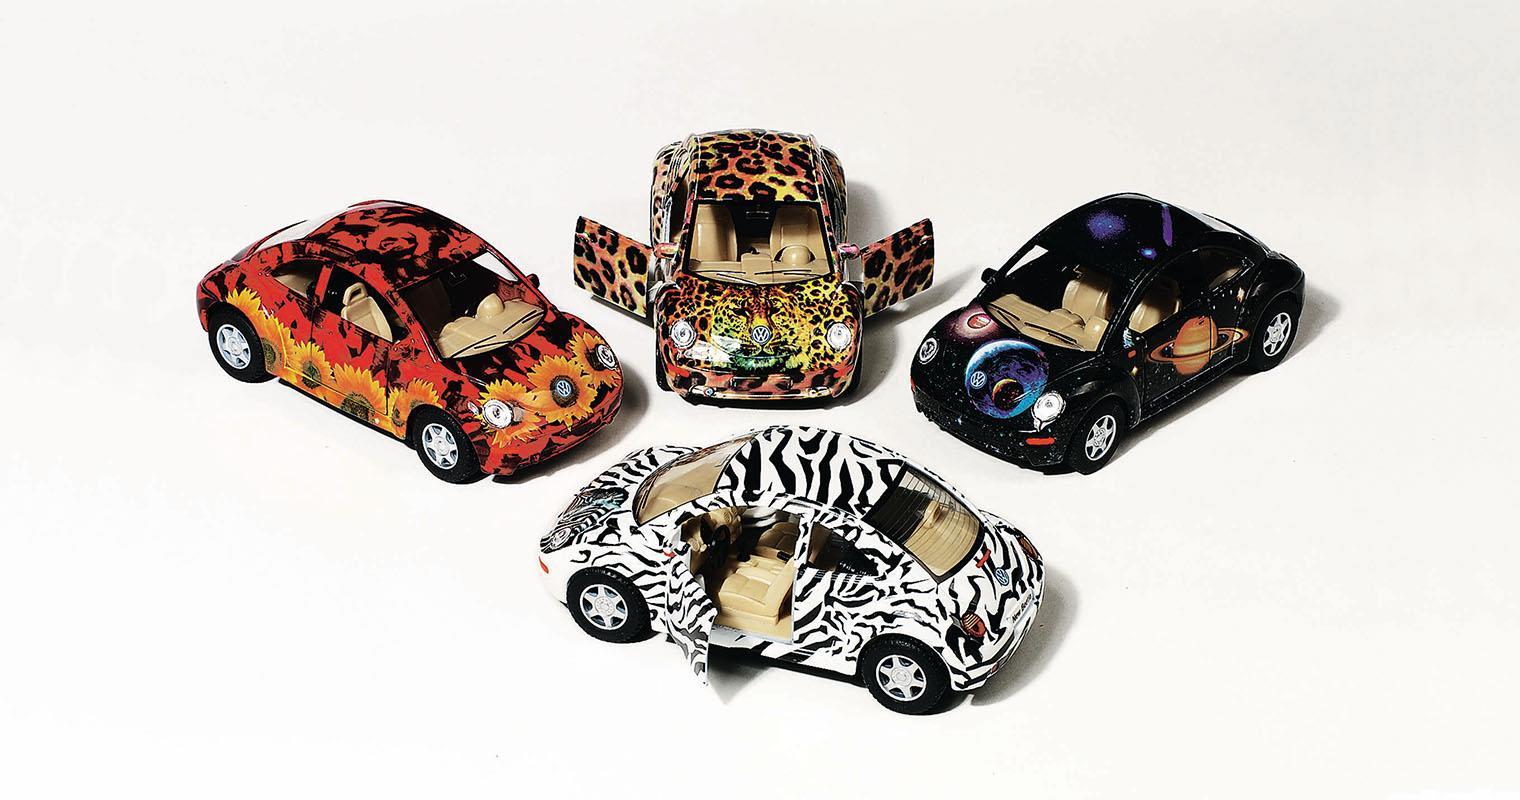 Goki Goki αυτοκινητάκια μεταλλικά 12,7εκ. σε 4 χρώματα 23727---ΒΠ-2